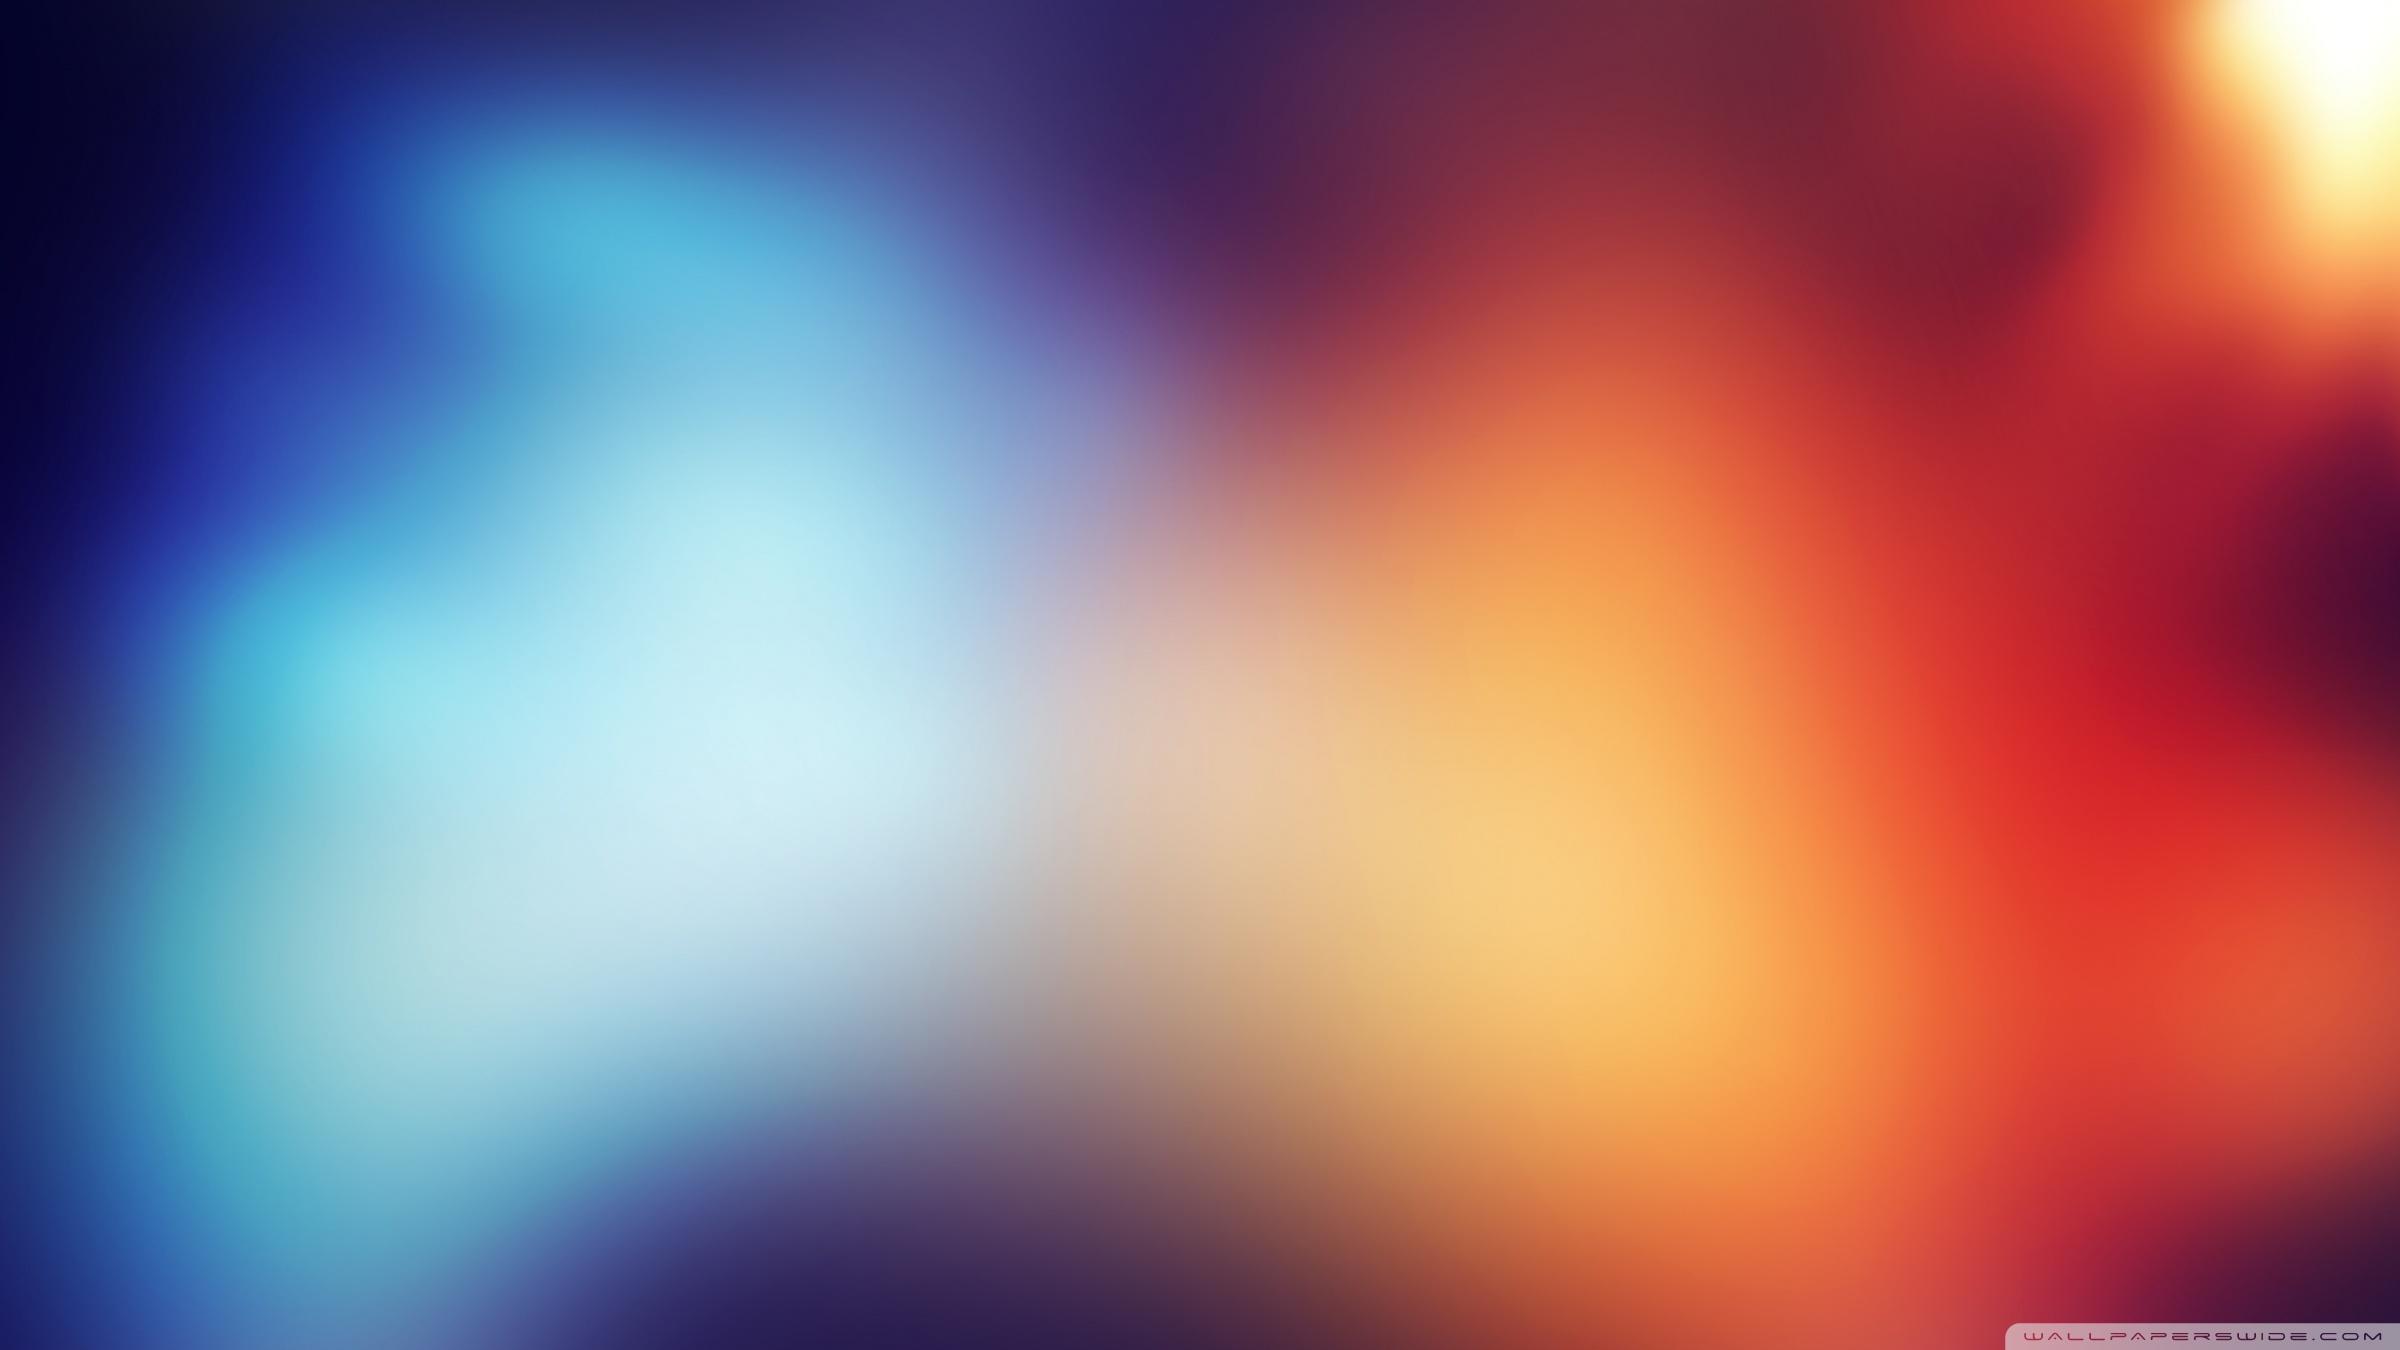 Blue And Red 4K HD Desktop Wallpaper For 4K Ultra HD TV